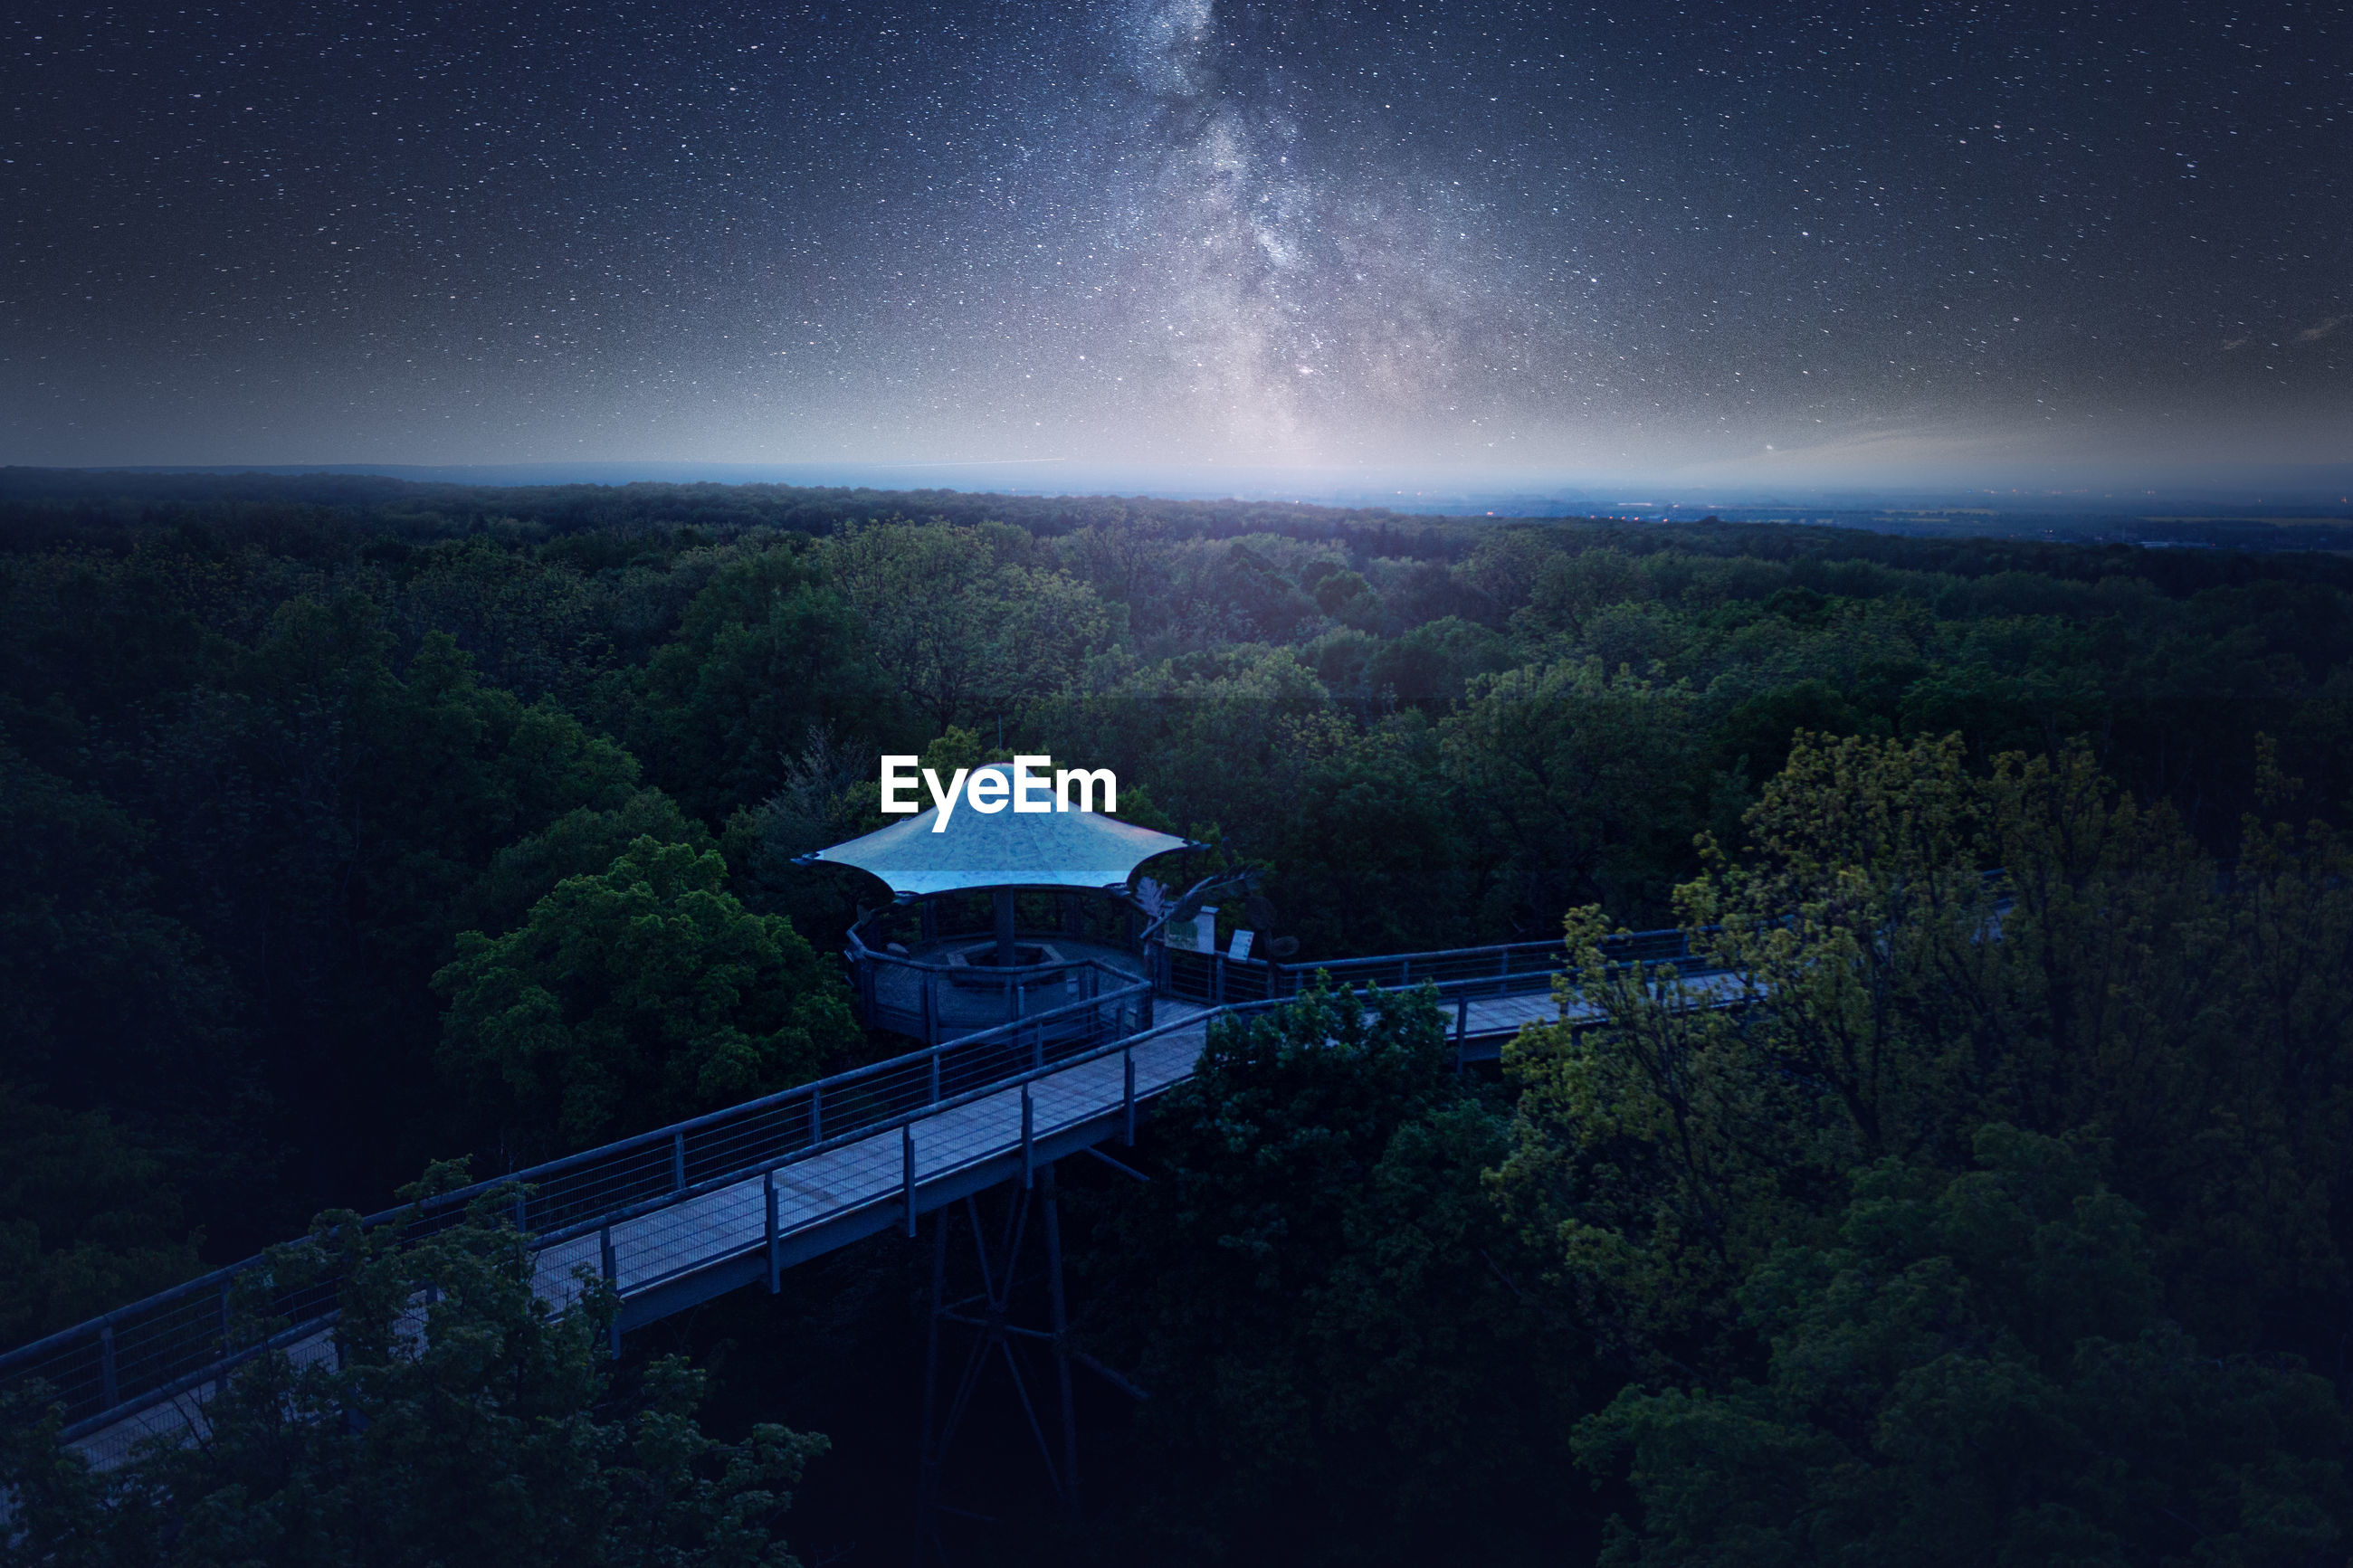 SCENIC VIEW OF BRIDGE AGAINST SKY AT NIGHT